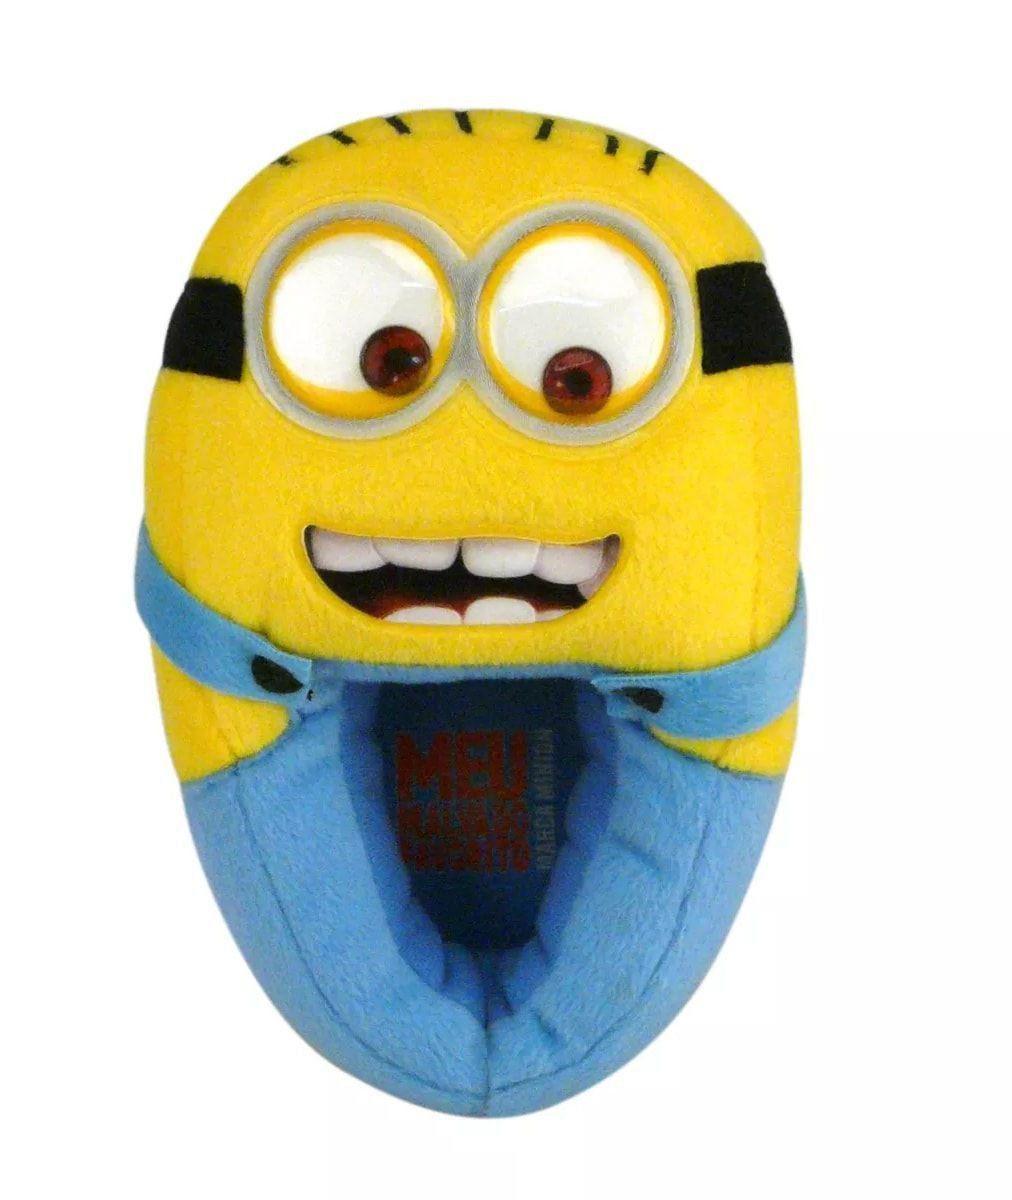 93a26deb356efa Pantufa 3D Minions: Meu Malvado Favorito - Ricsen - Toyshow